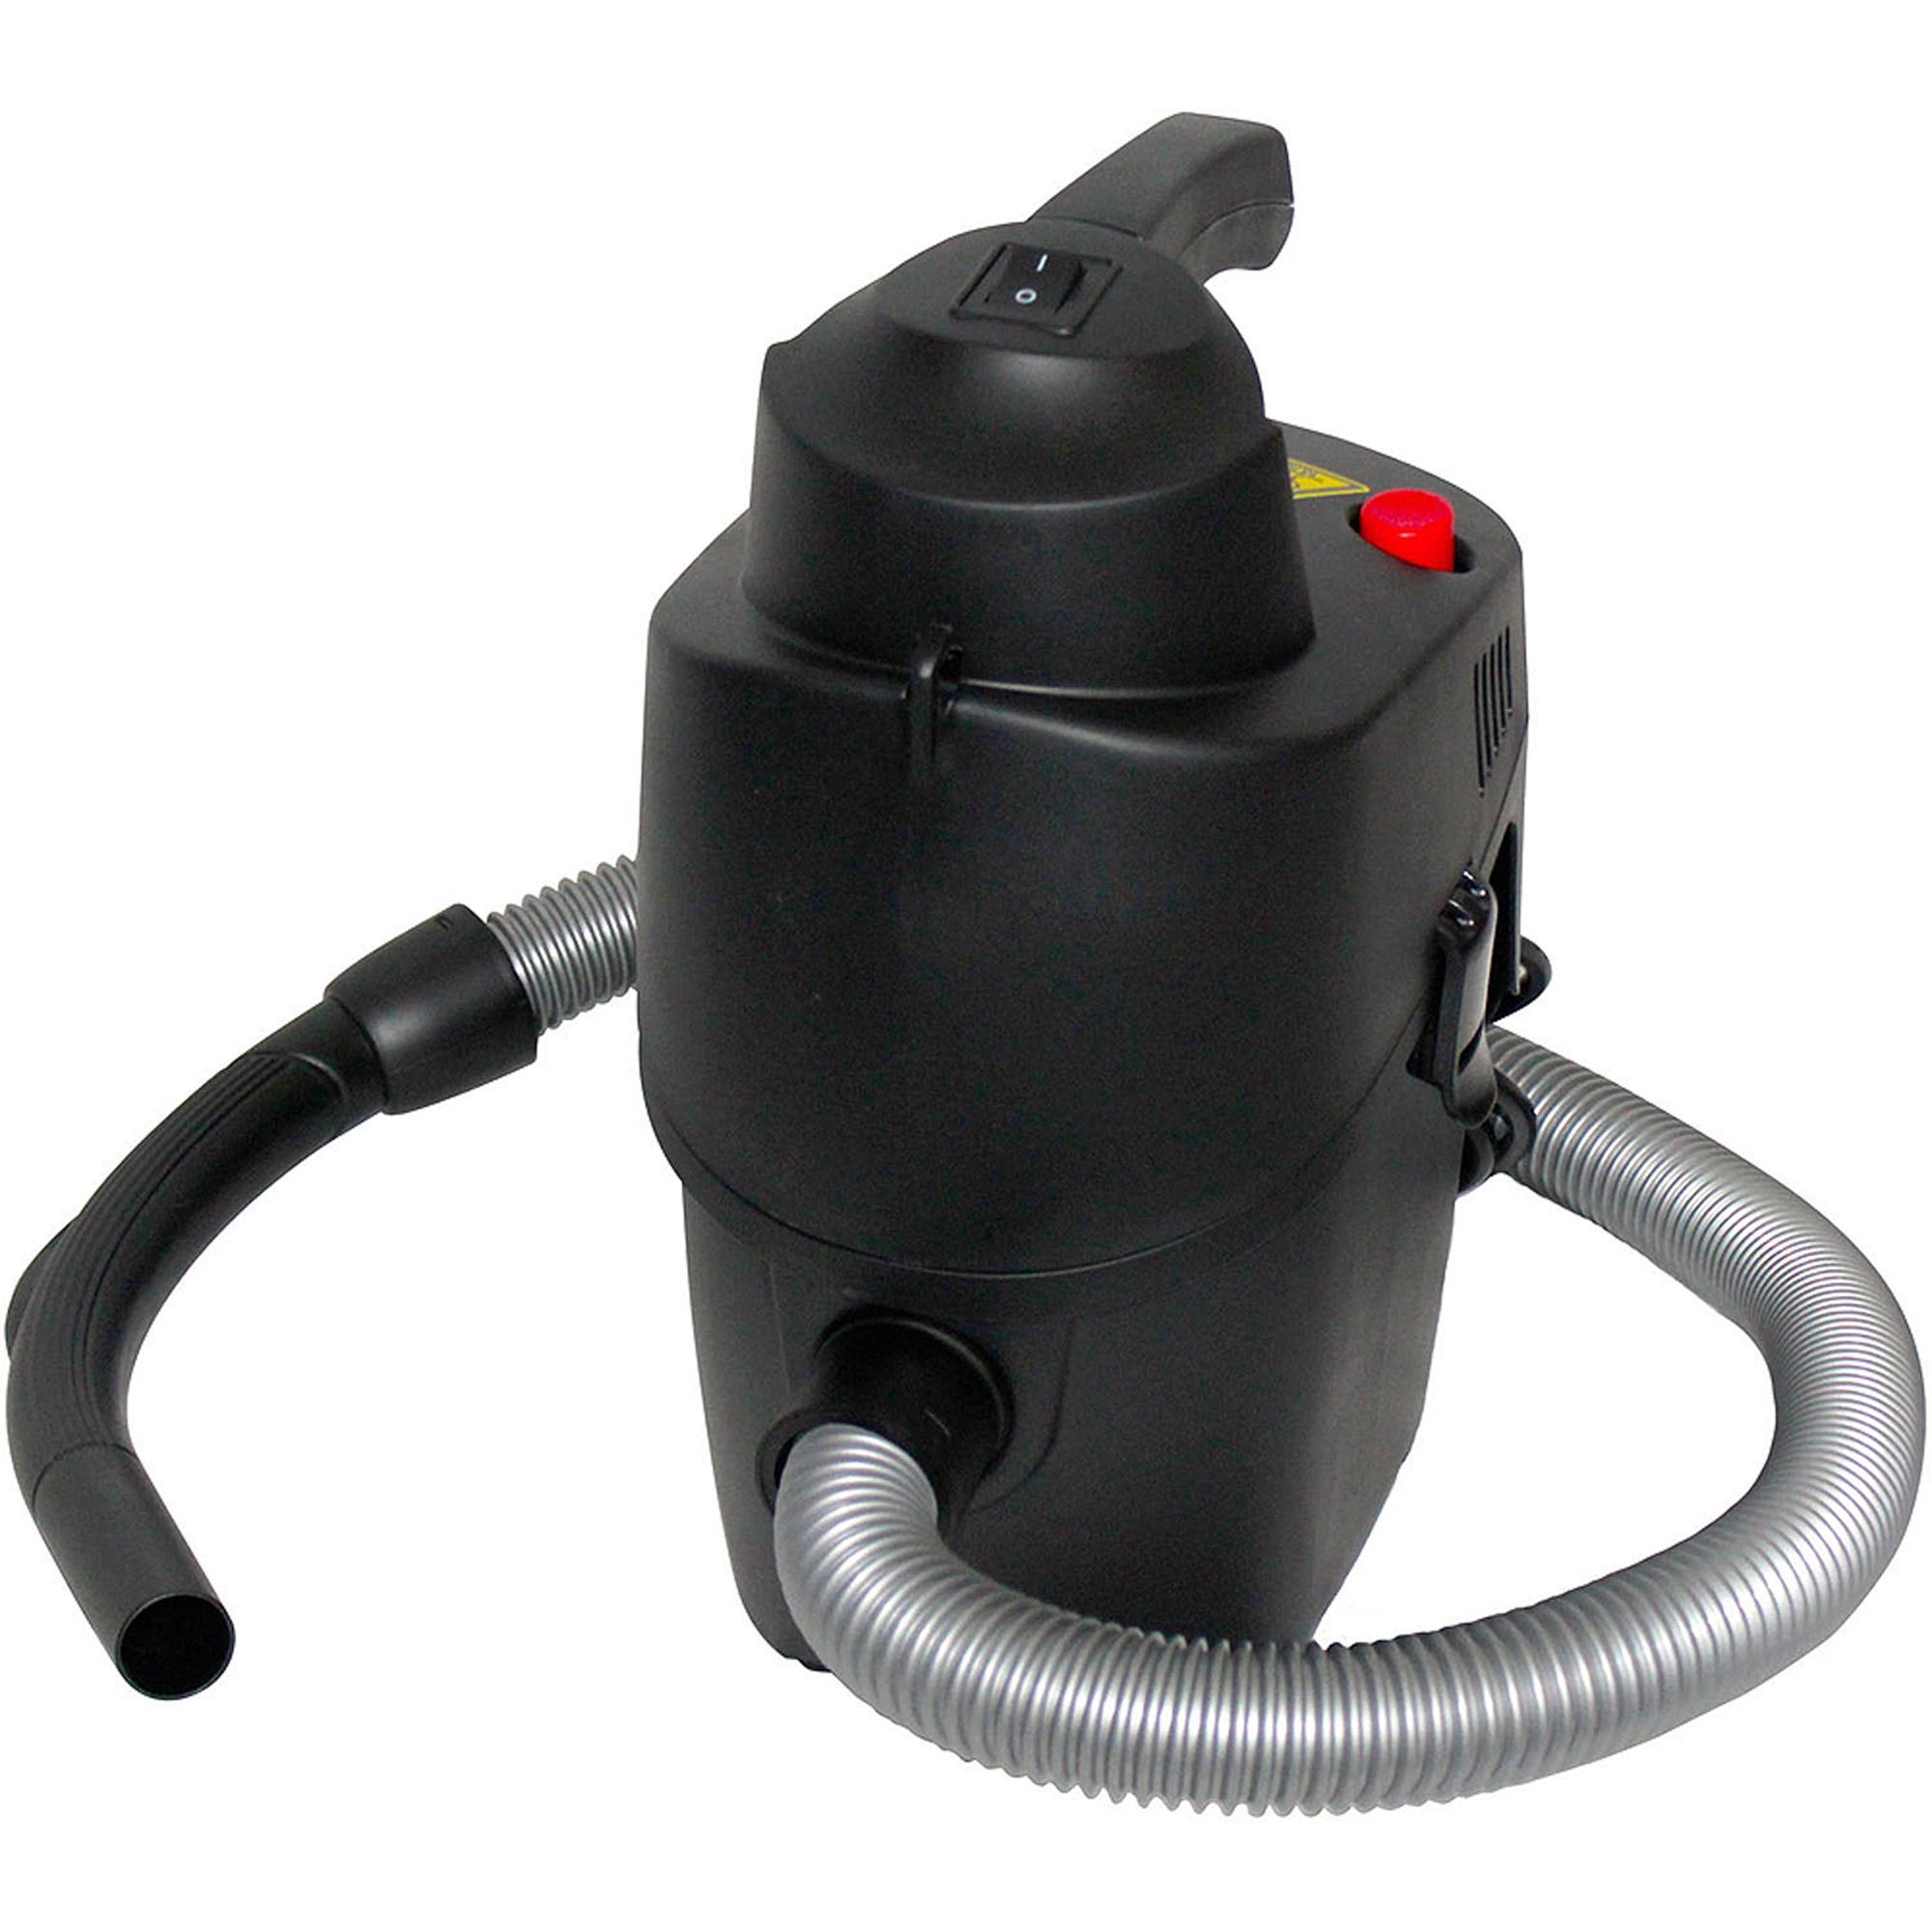 Keystone SMARTVAC 4.5HP Self-Cleaning Hand-Held Indoor/Outdoor Dry Vac, Black